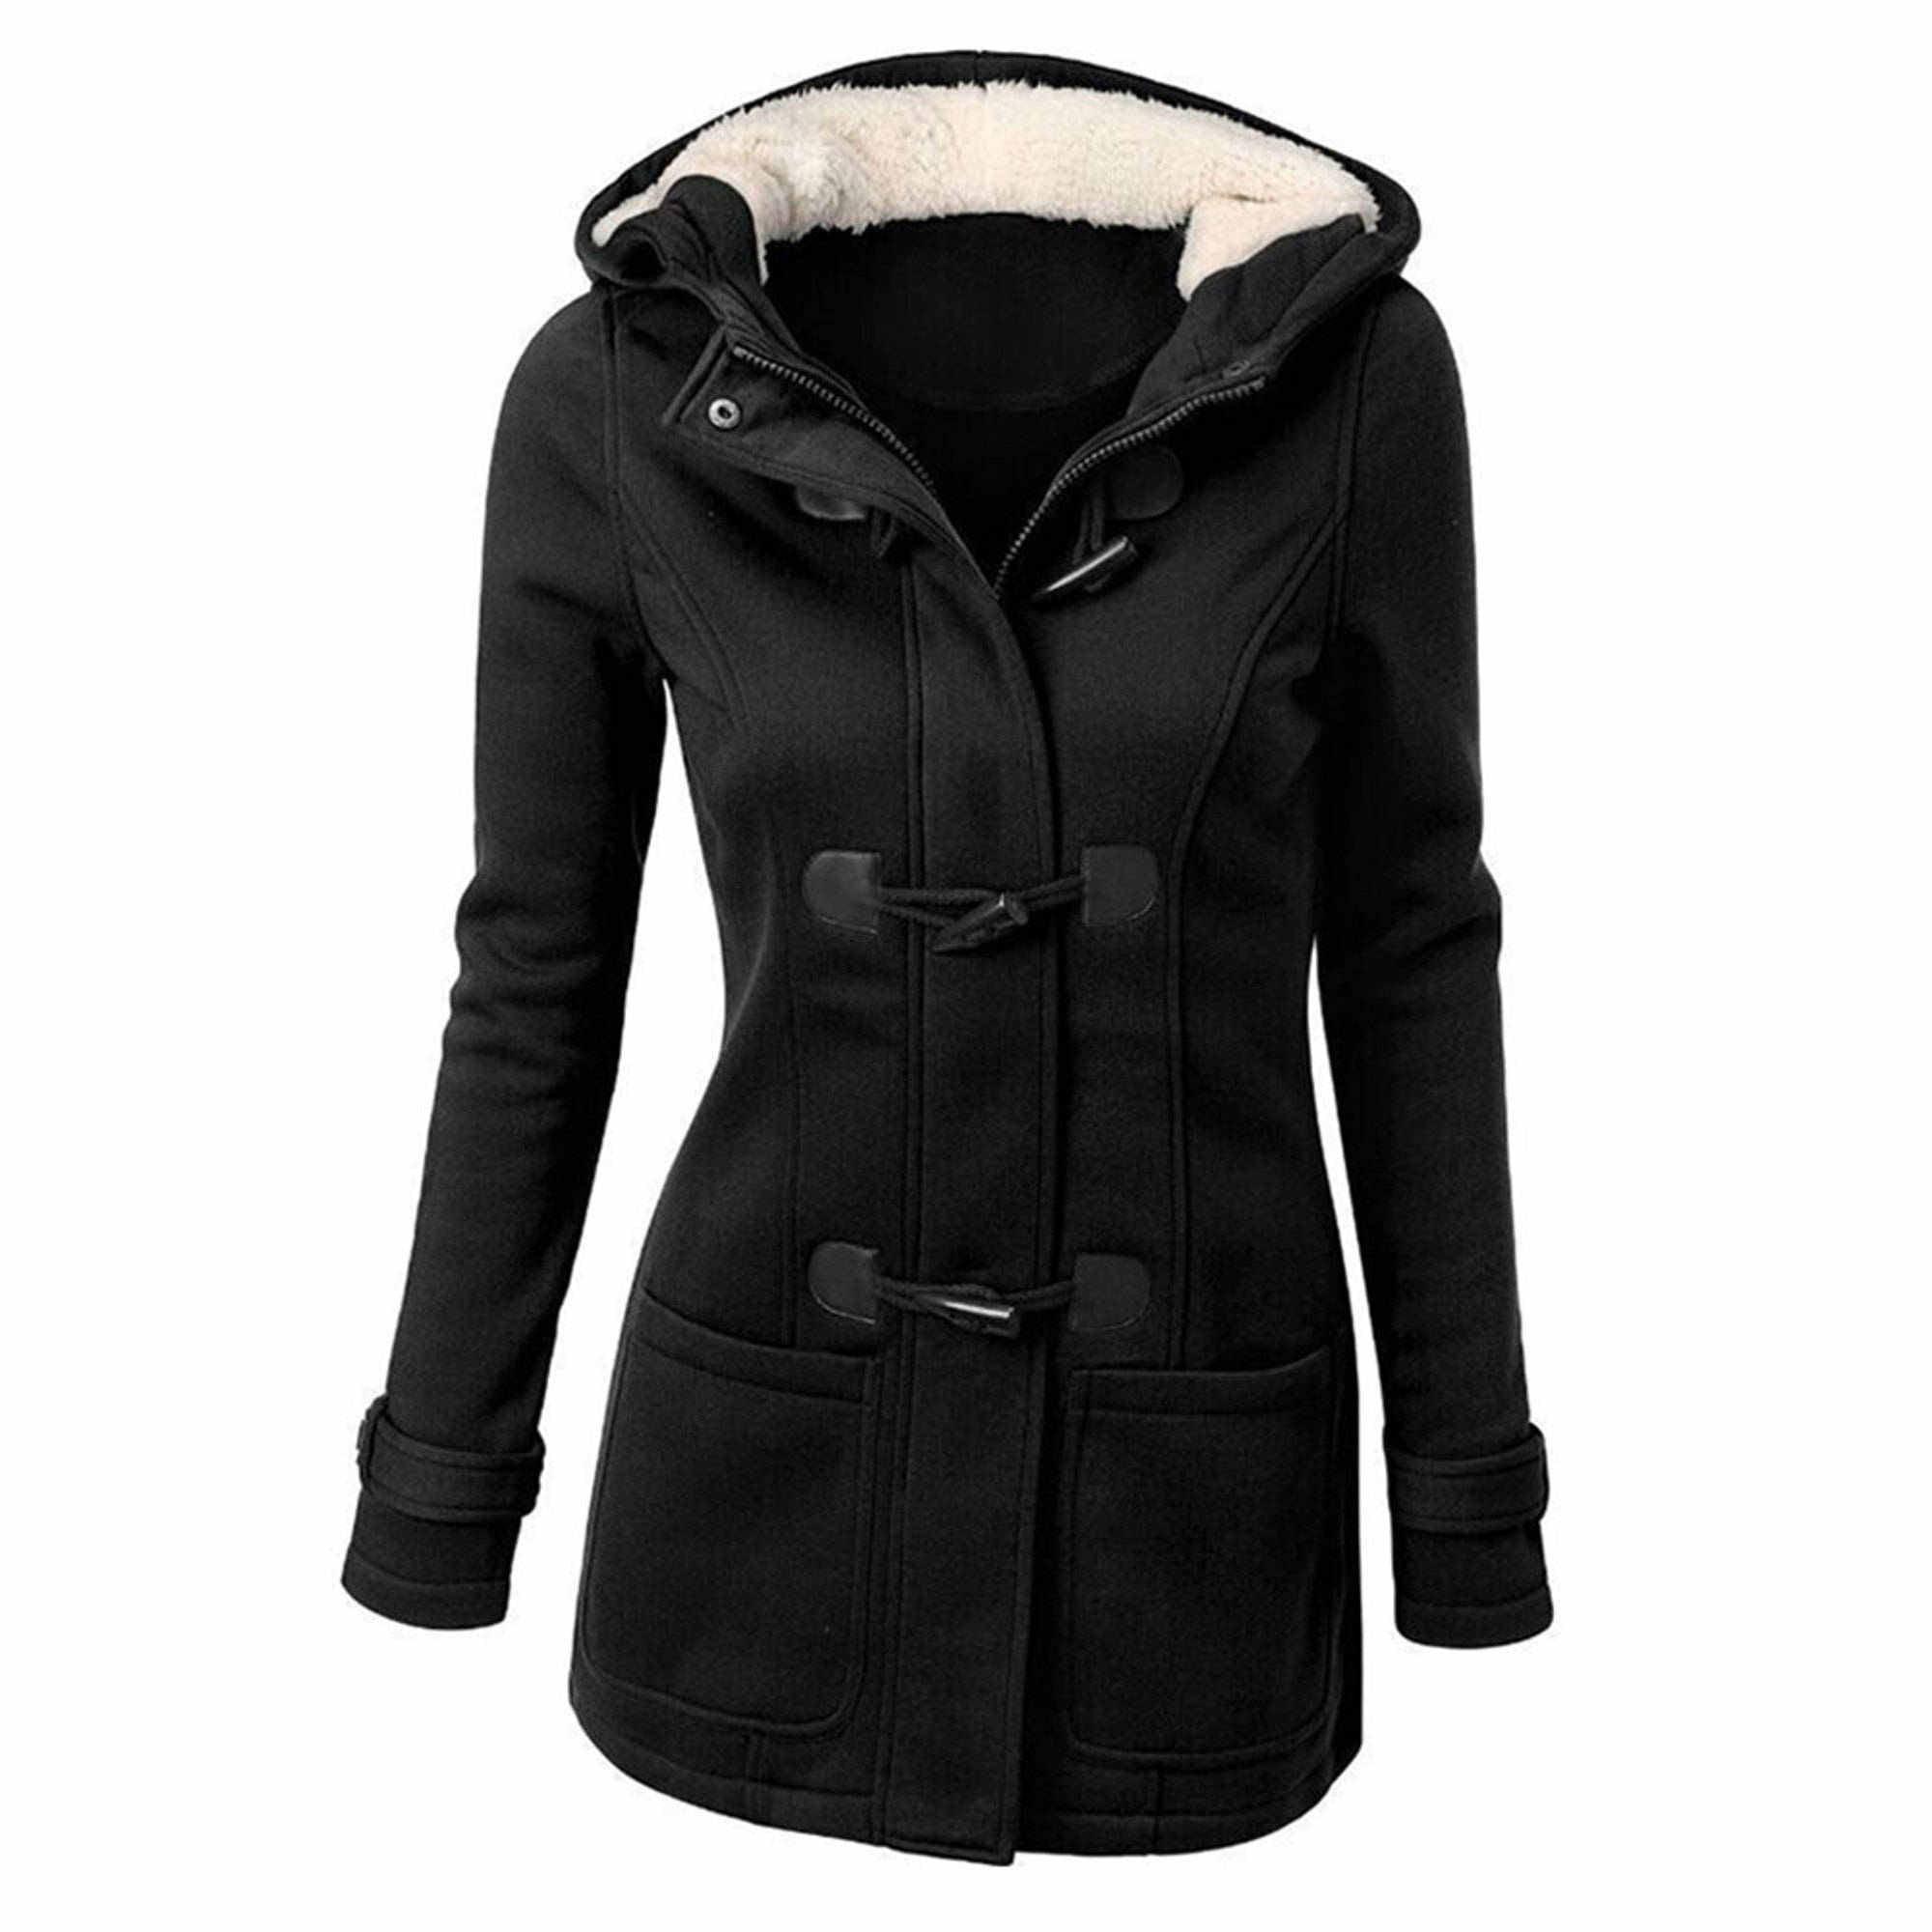 Women Hooded Warm Winter Coats Faux Fur Lined Parkas Cotton ...